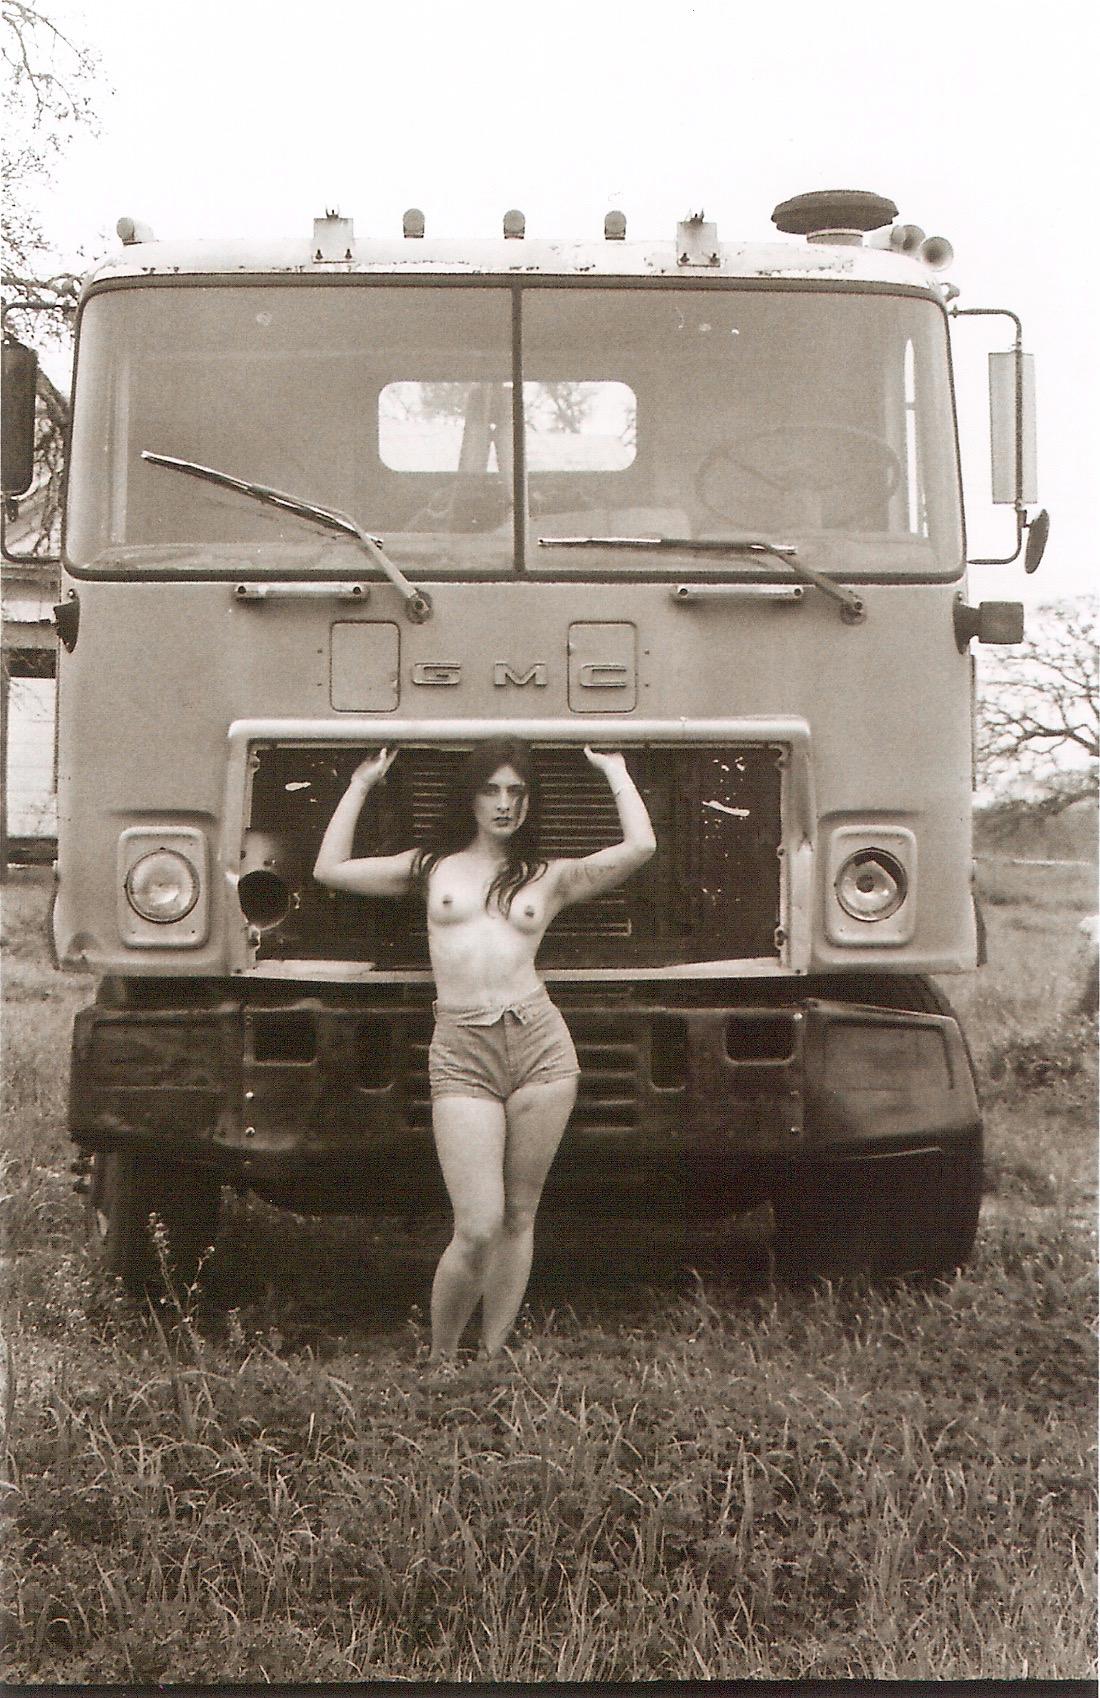 topless-girl-gmc-heavy-duty-truck-black-and-white-film-35mm-film-santana-social-club.jpeg